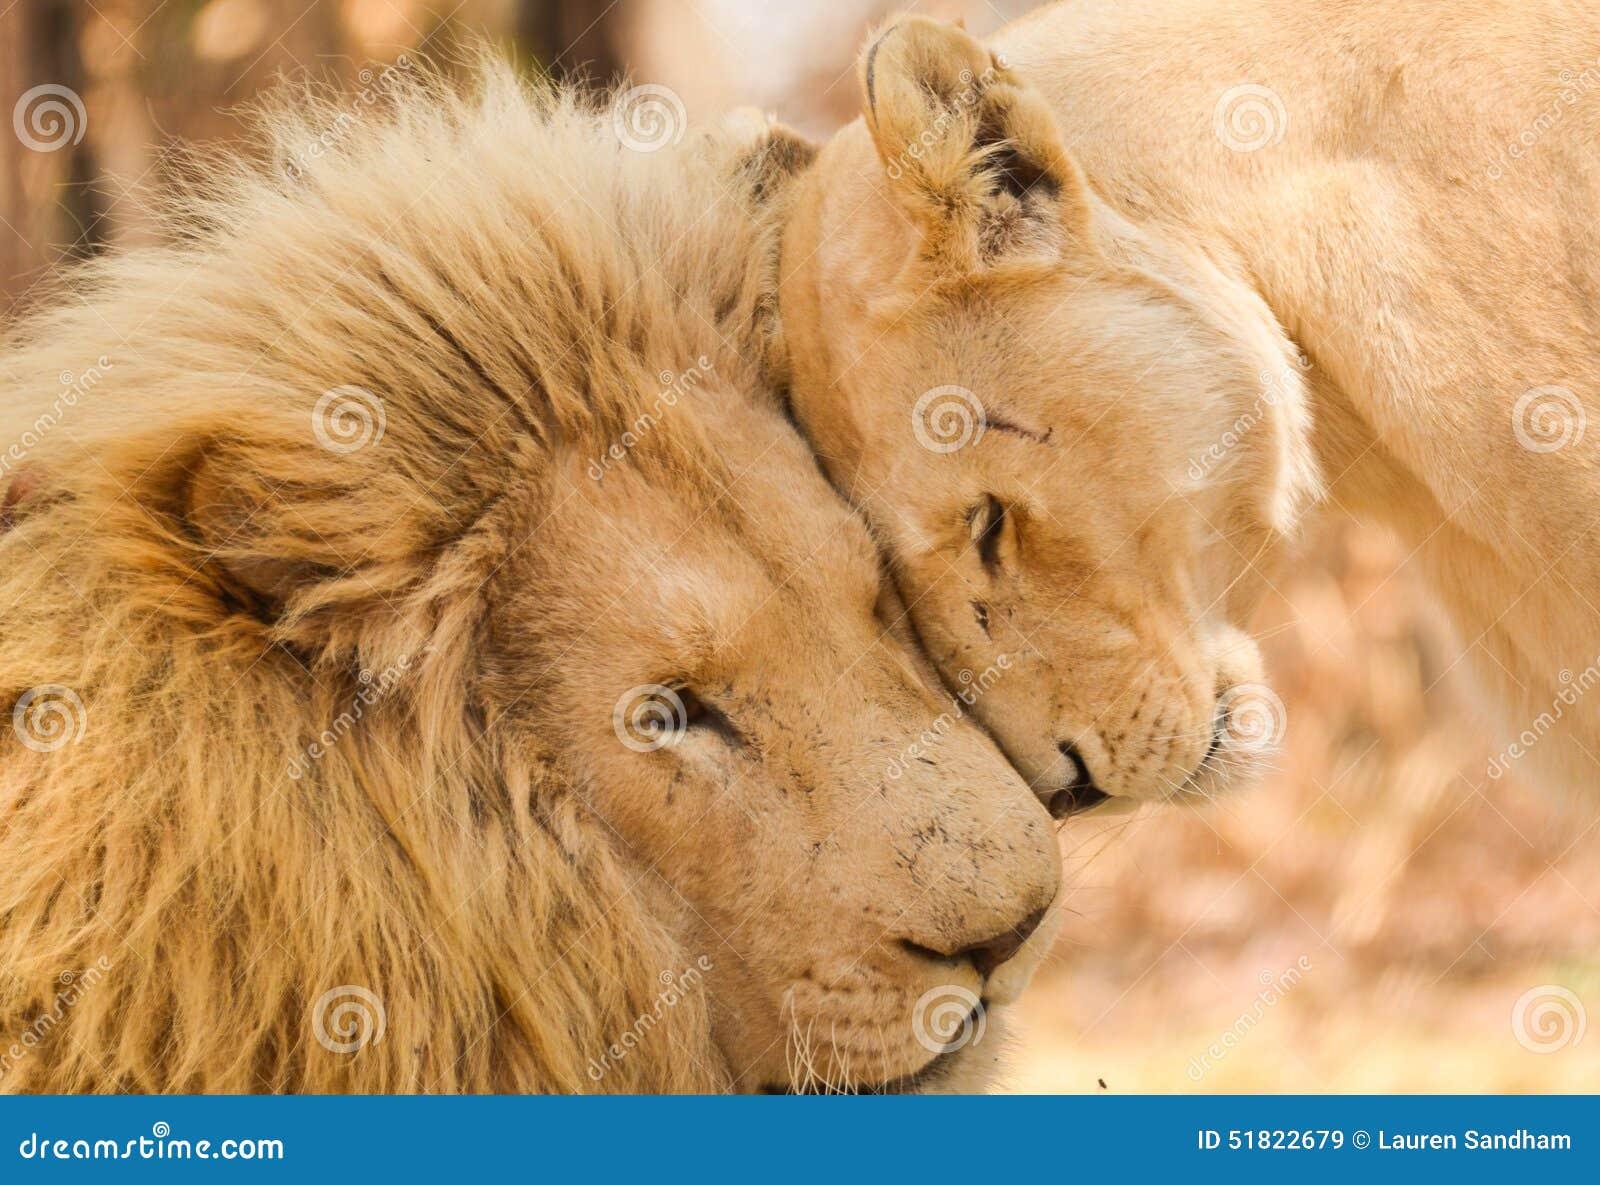 Amour majestueux